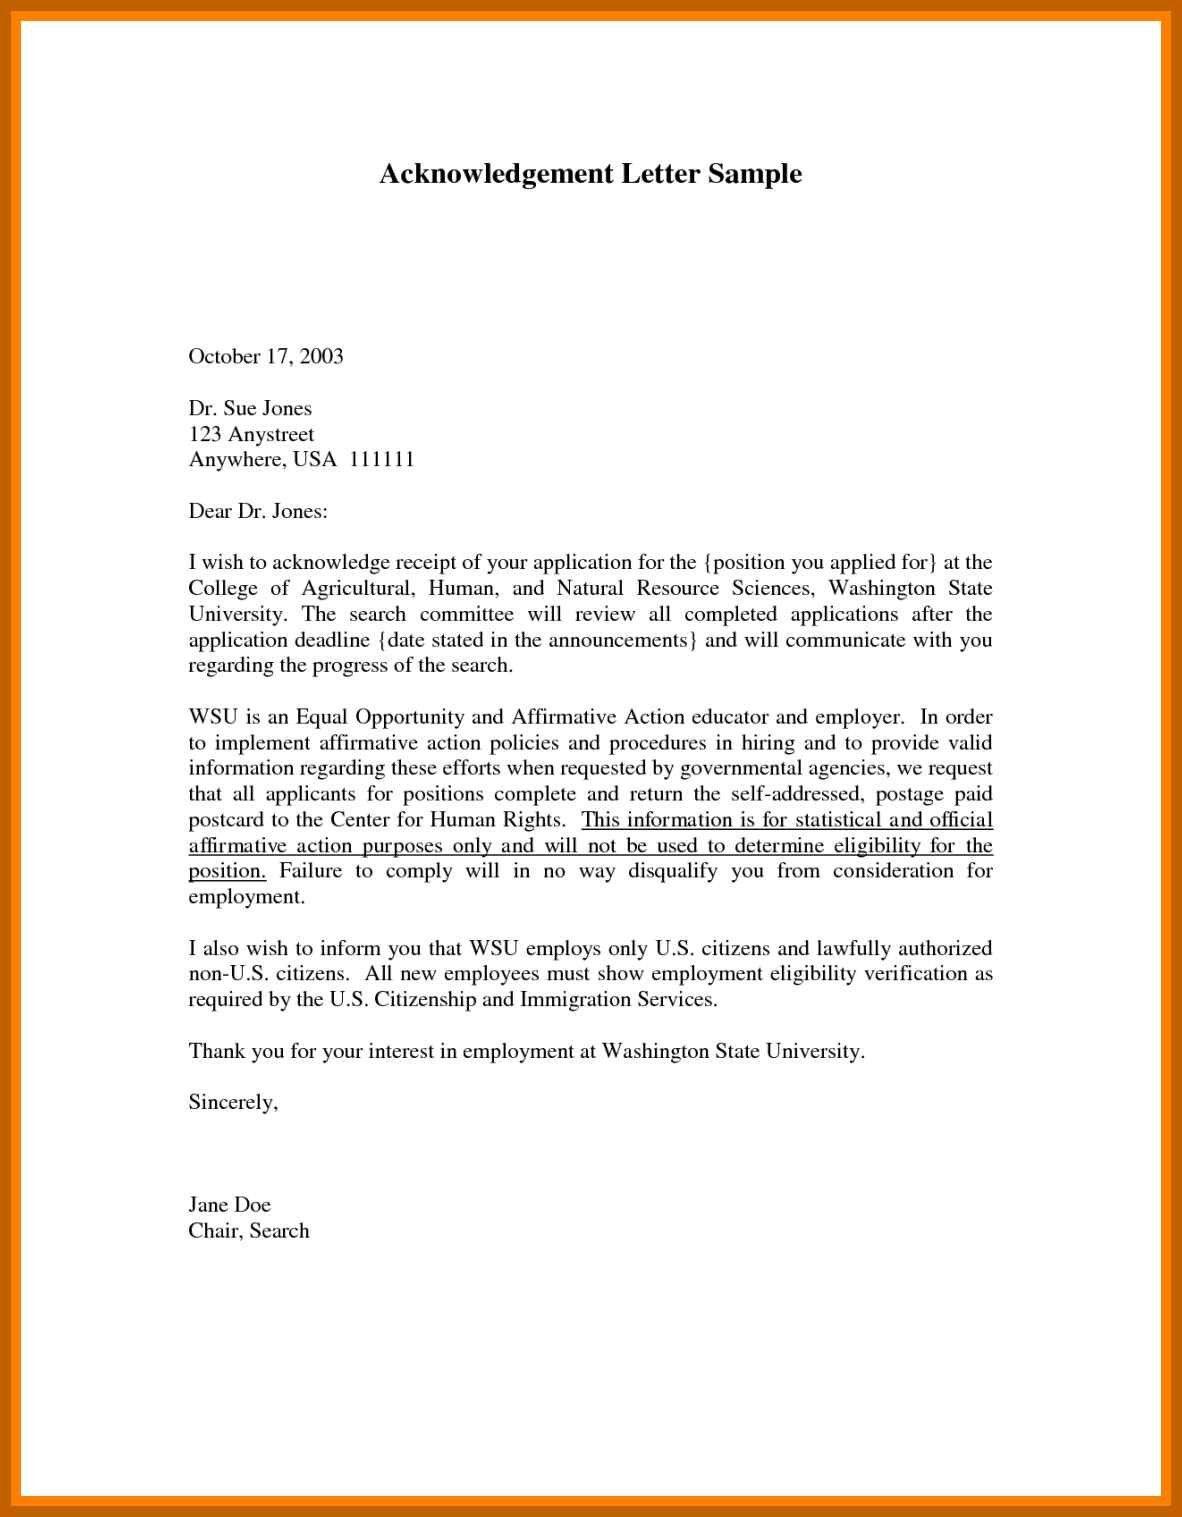 letter for immigration residency sample b tech resume format collection agent job description cv template it technician